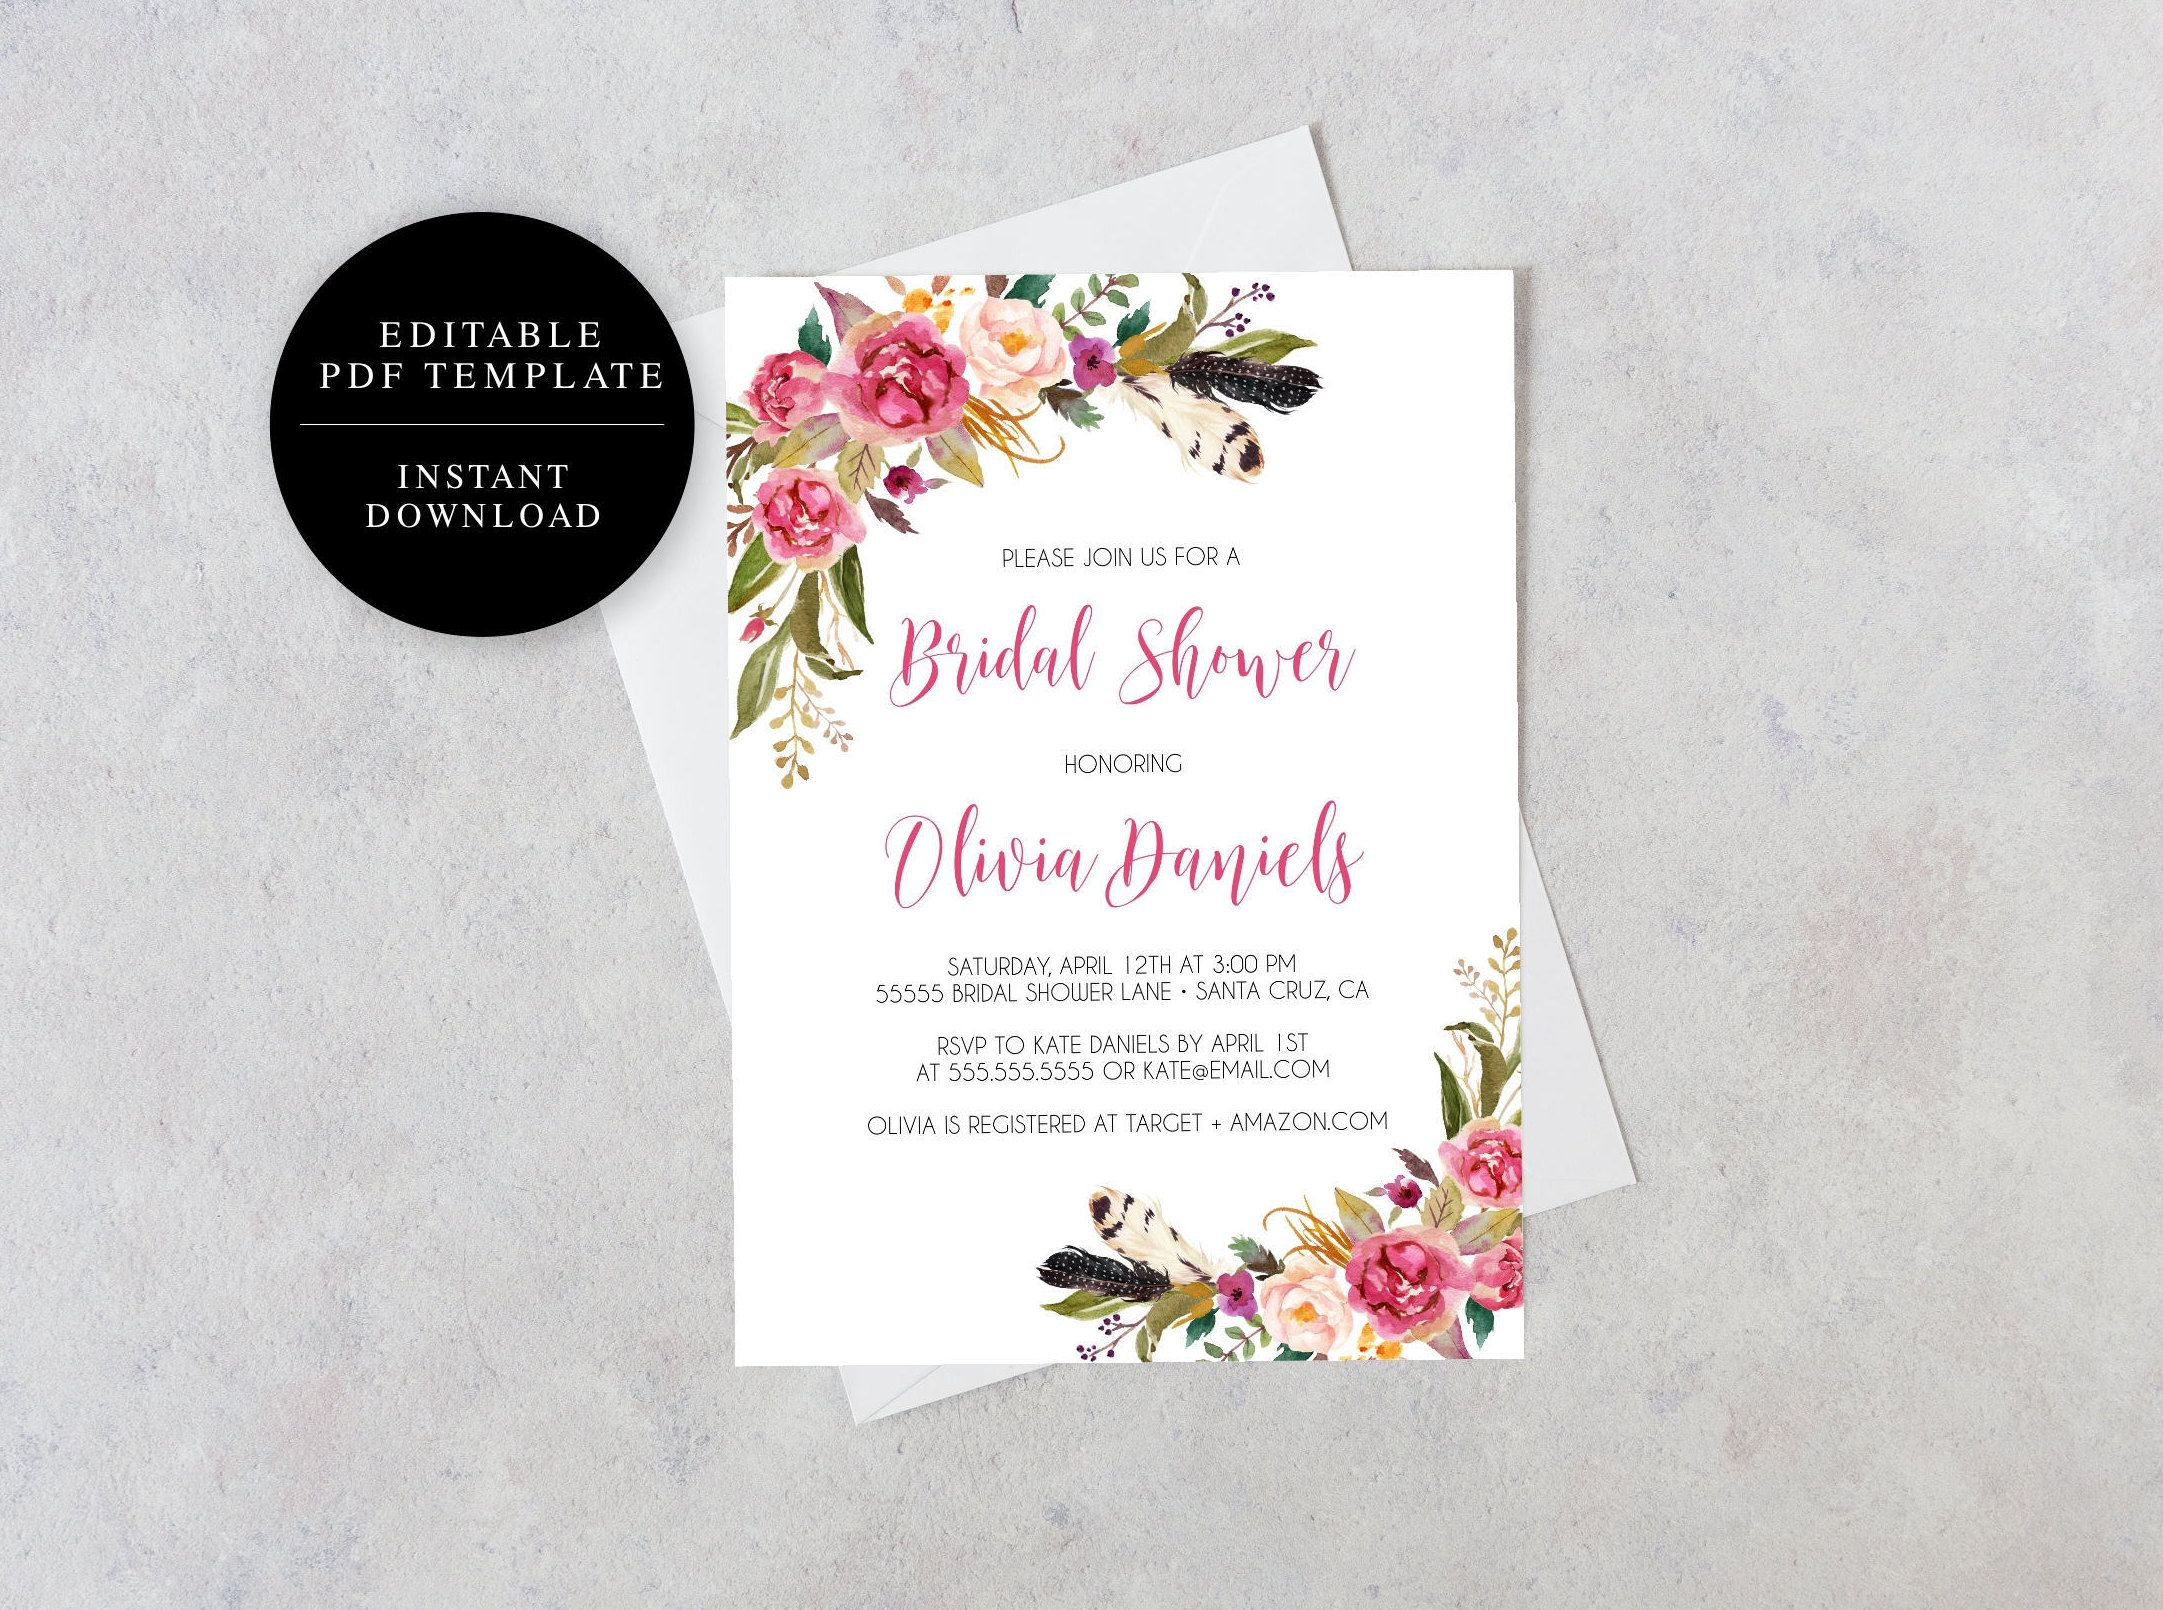 Printable Bridal Shower Invitation, Boho Bohemian, Editable, Instant ...